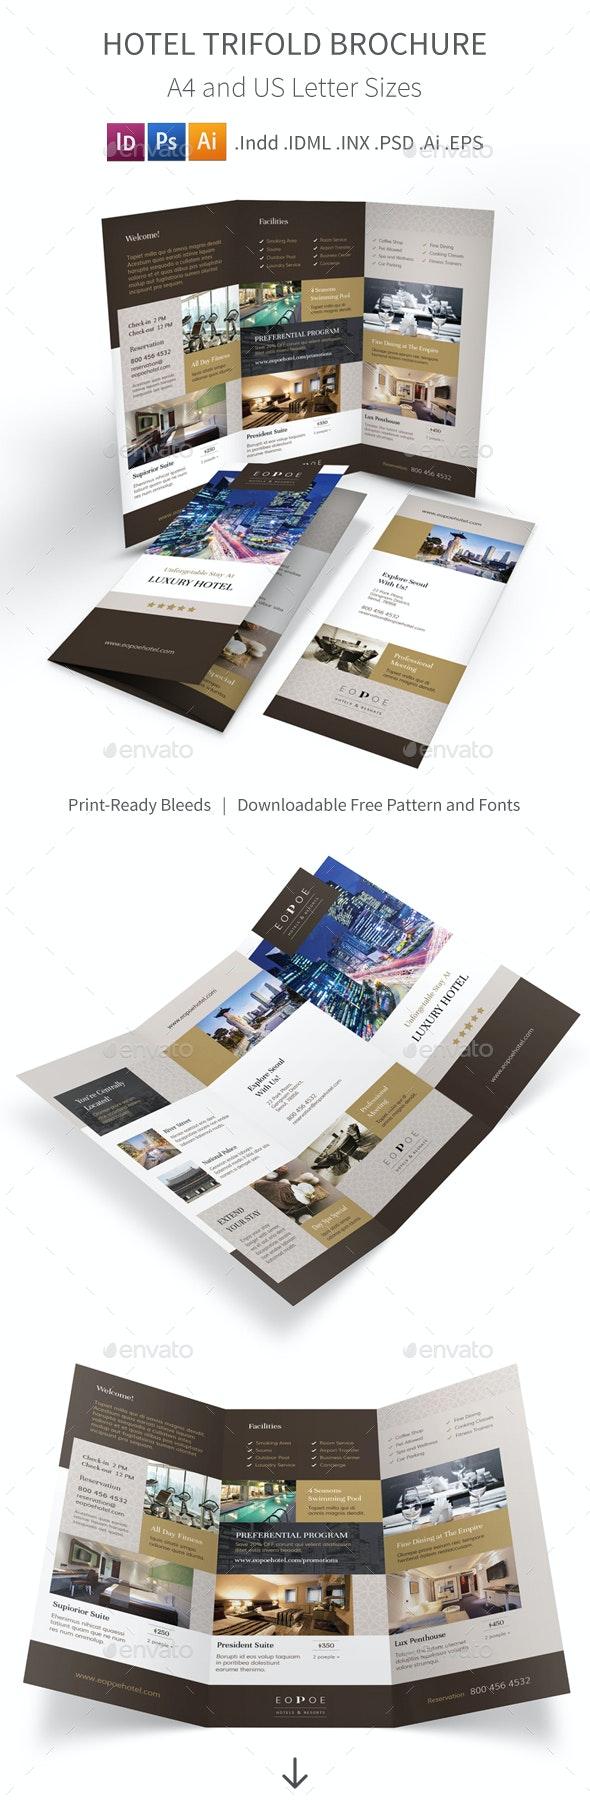 Hotel Trifold Brochure 5 - Corporate Brochures